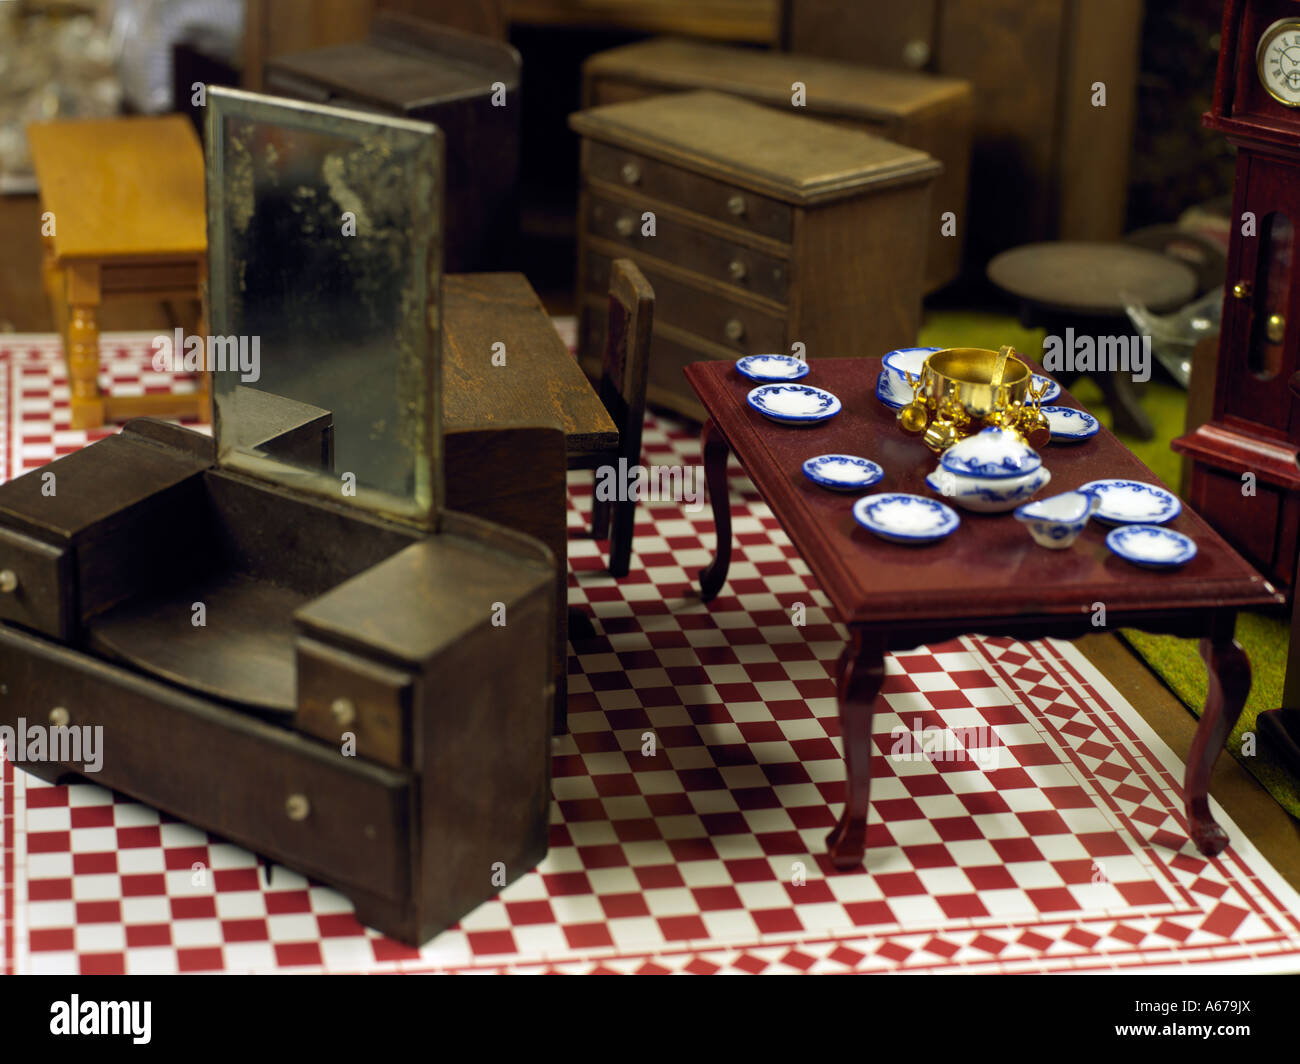 toy furniture - Stock Image